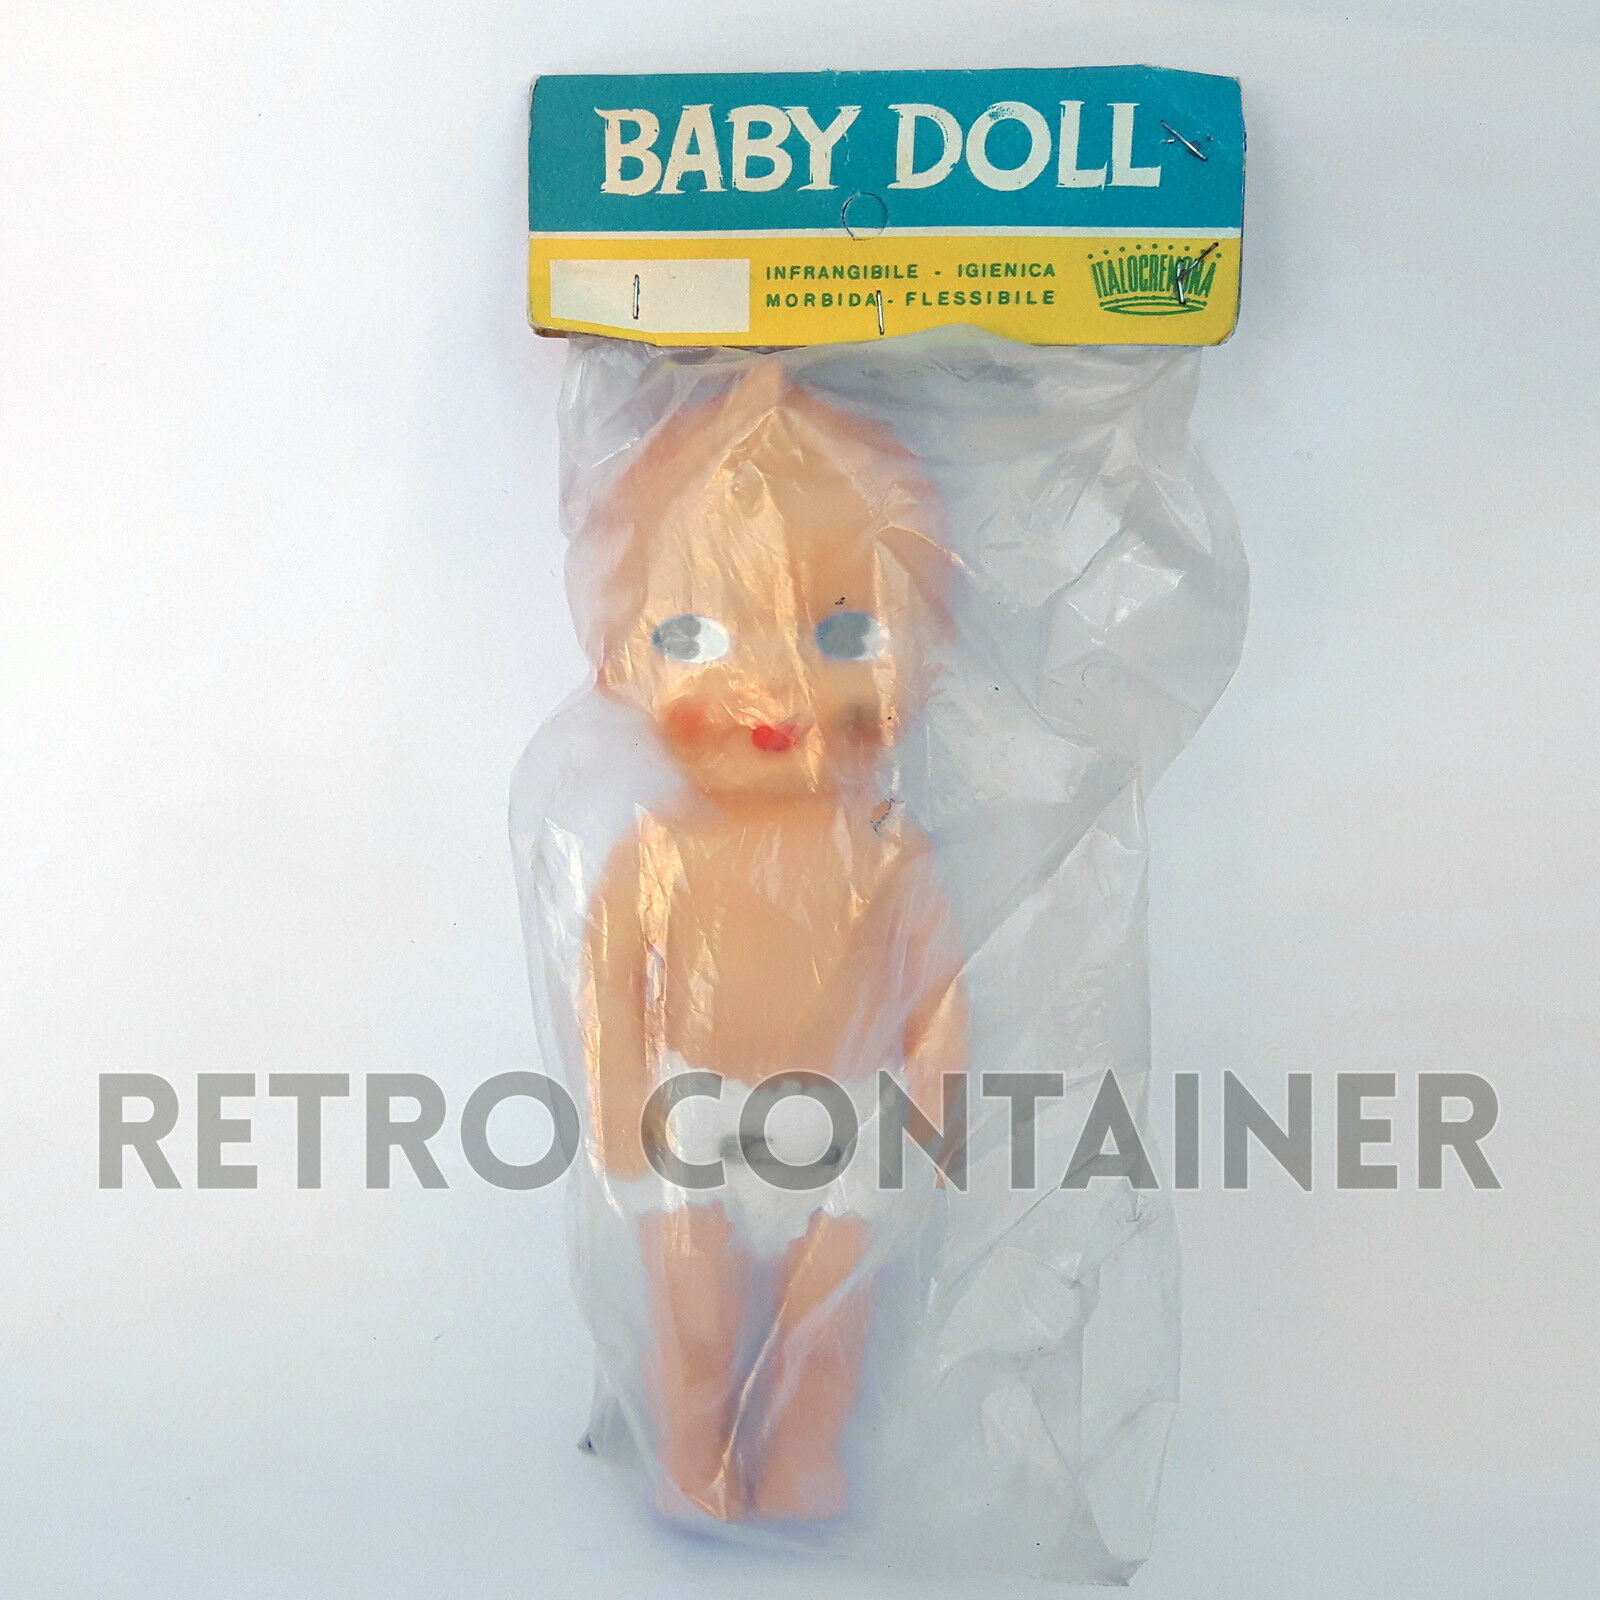 Vintage Italian Doll BABY DOLL ITALOCREMONA Bambola Nuova Sigillata Sigillata Sigillata MISB MOC NEW c95f41